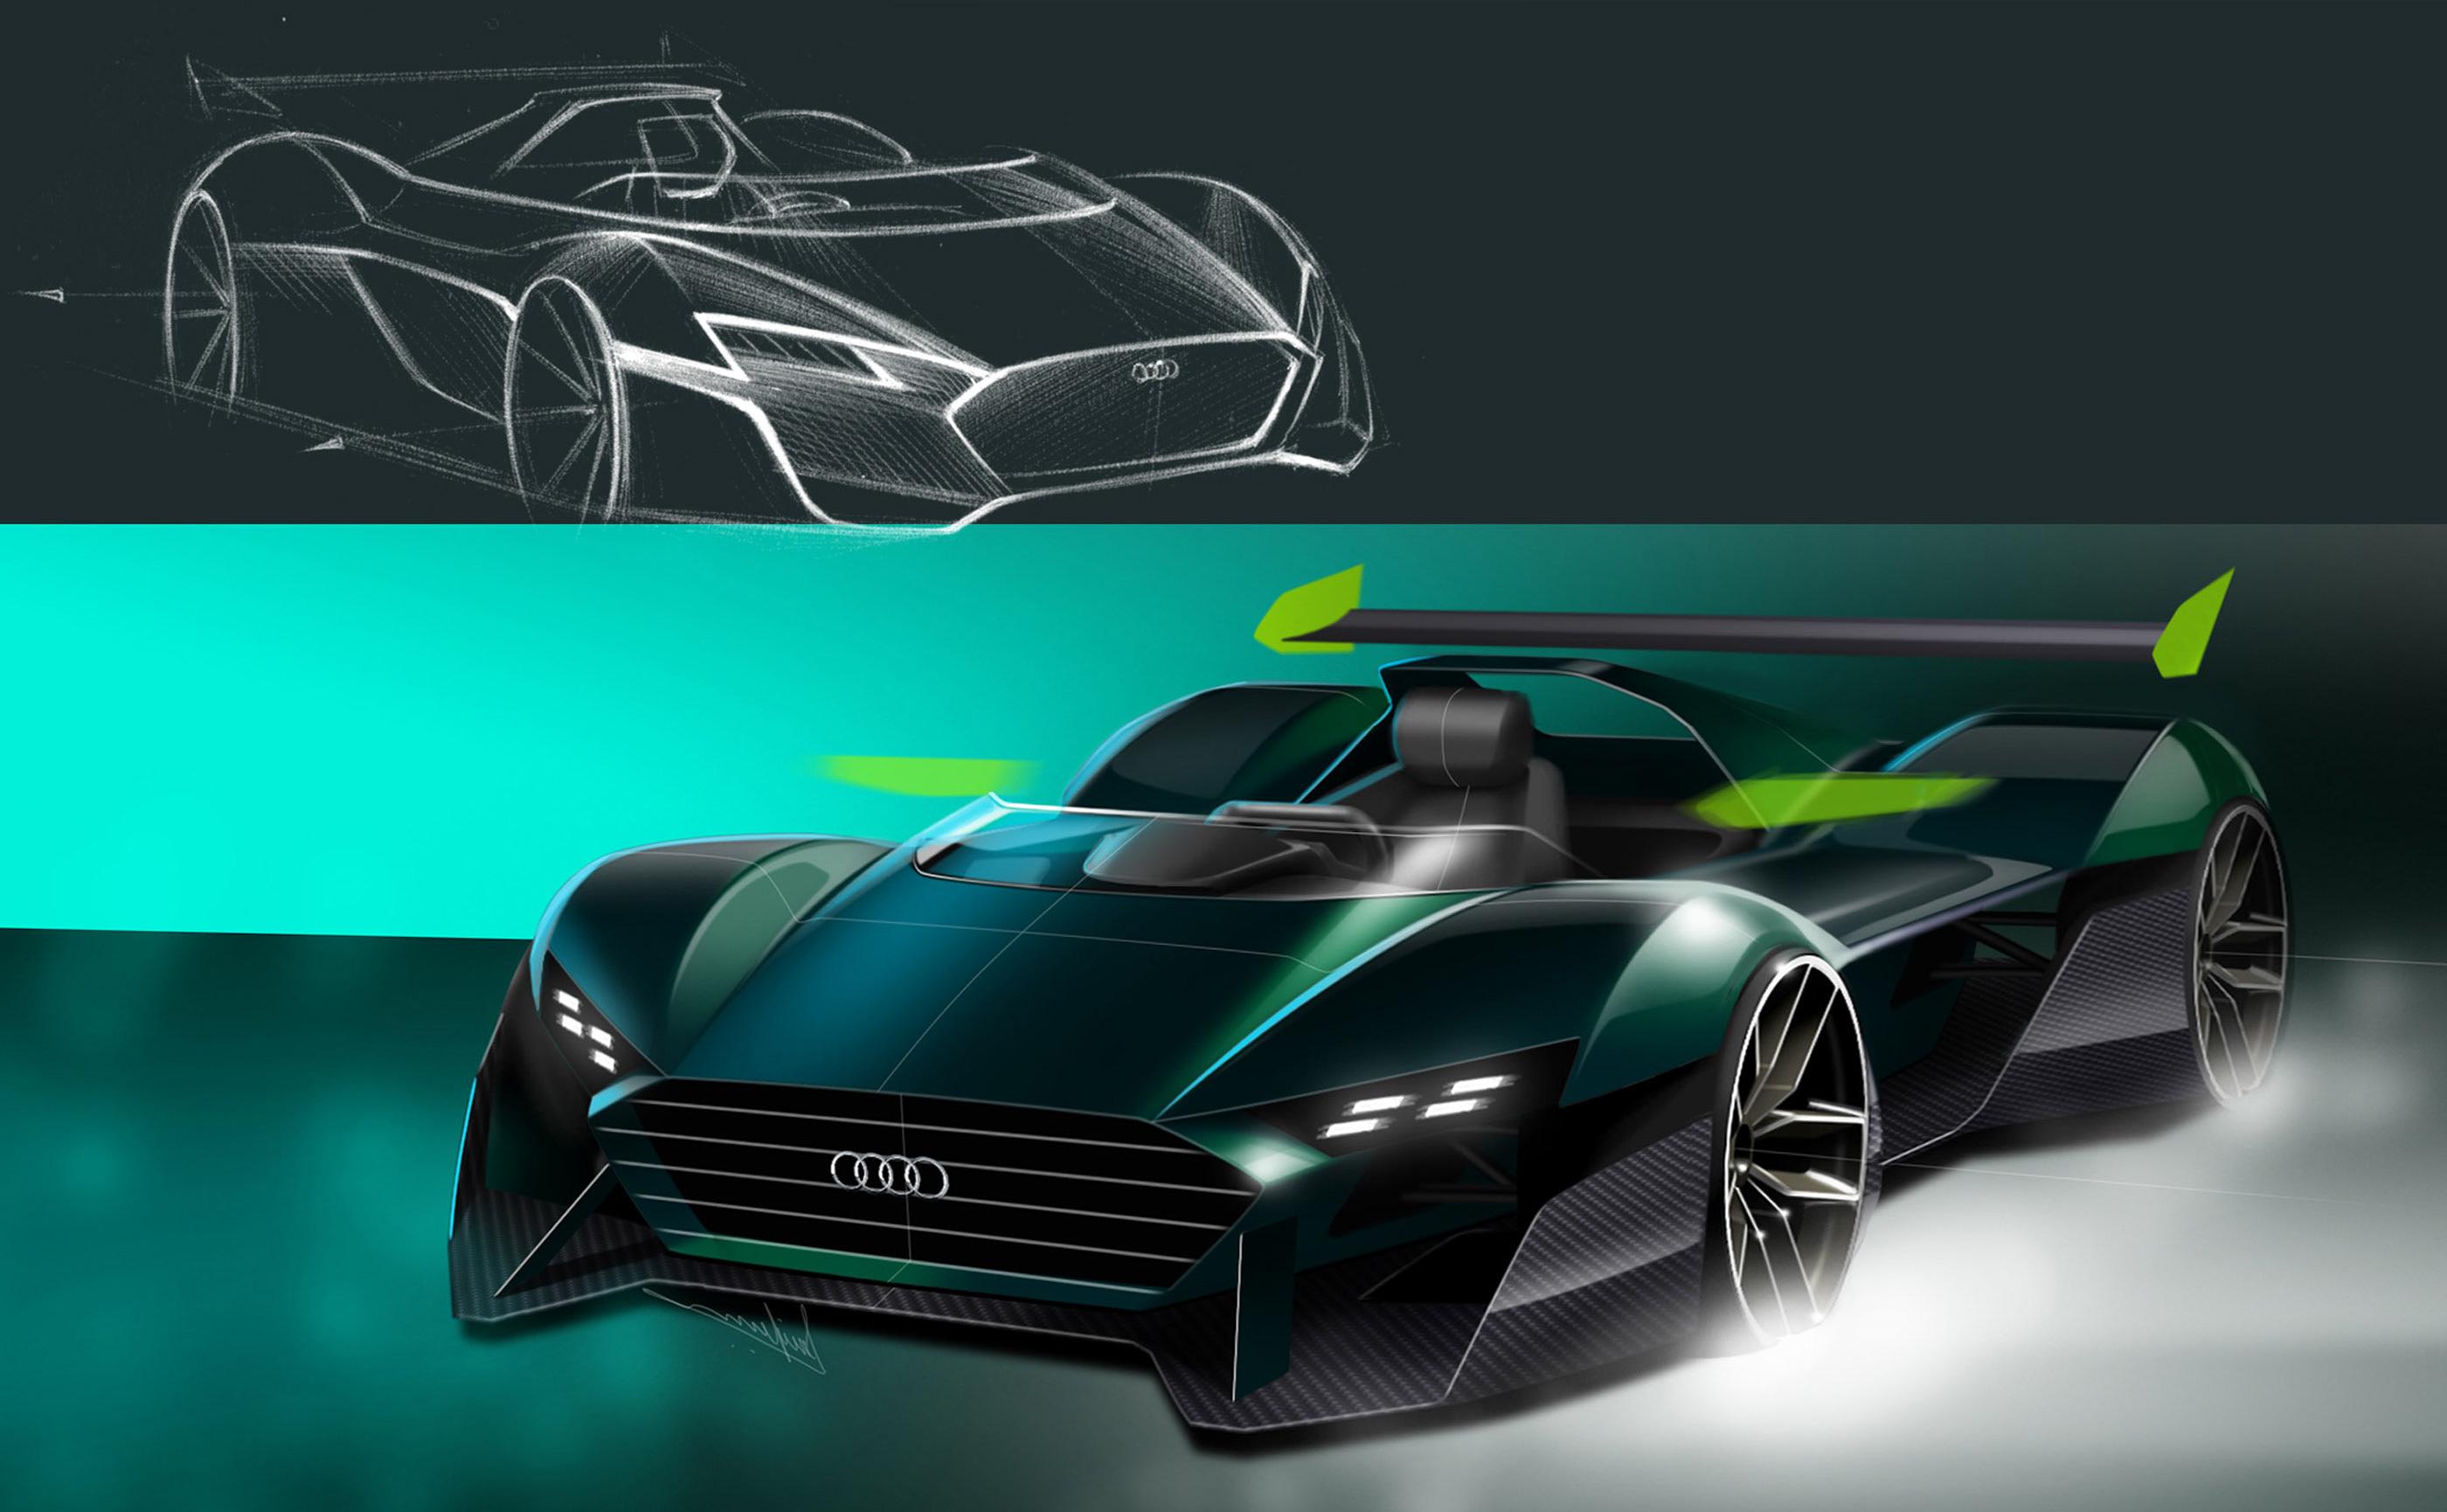 Kelebihan Audi R9 Tangguh